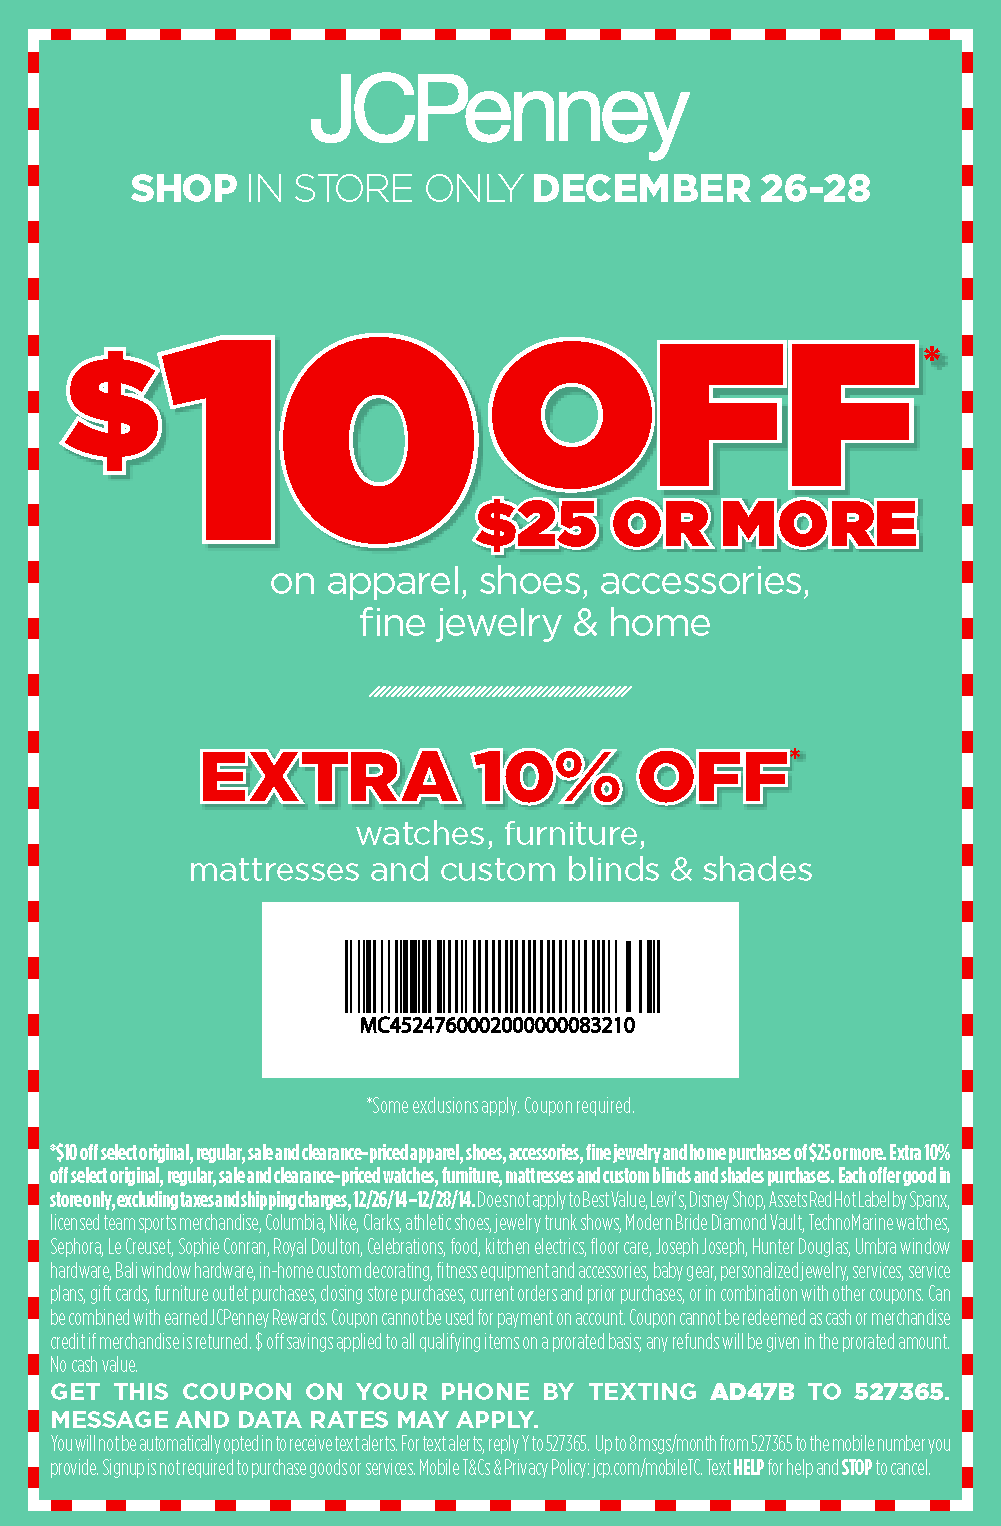 Woot $10 coupon code